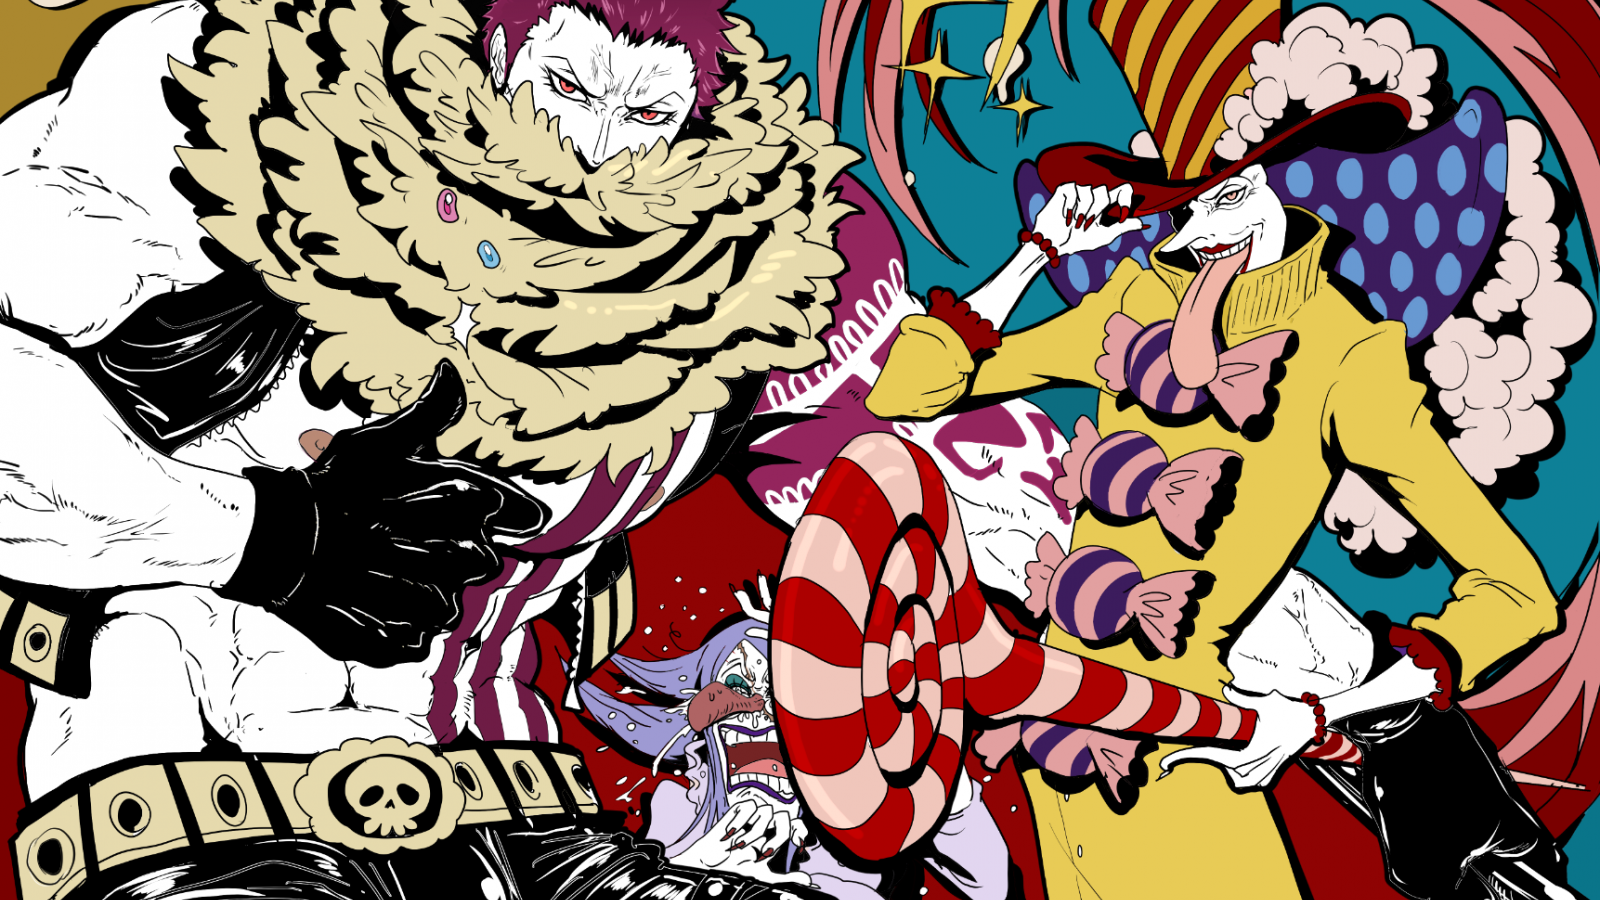 Free Download Charlotte Katakuri One Piece Zerochan Anime Image Board 1723x1289 For Your Desktop Mobile Tablet Explore 95 Charlotte Katakuri Wallpapers Charlotte Katakuri Wallpapers Charlotte Background Unc Charlotte Wallpaper